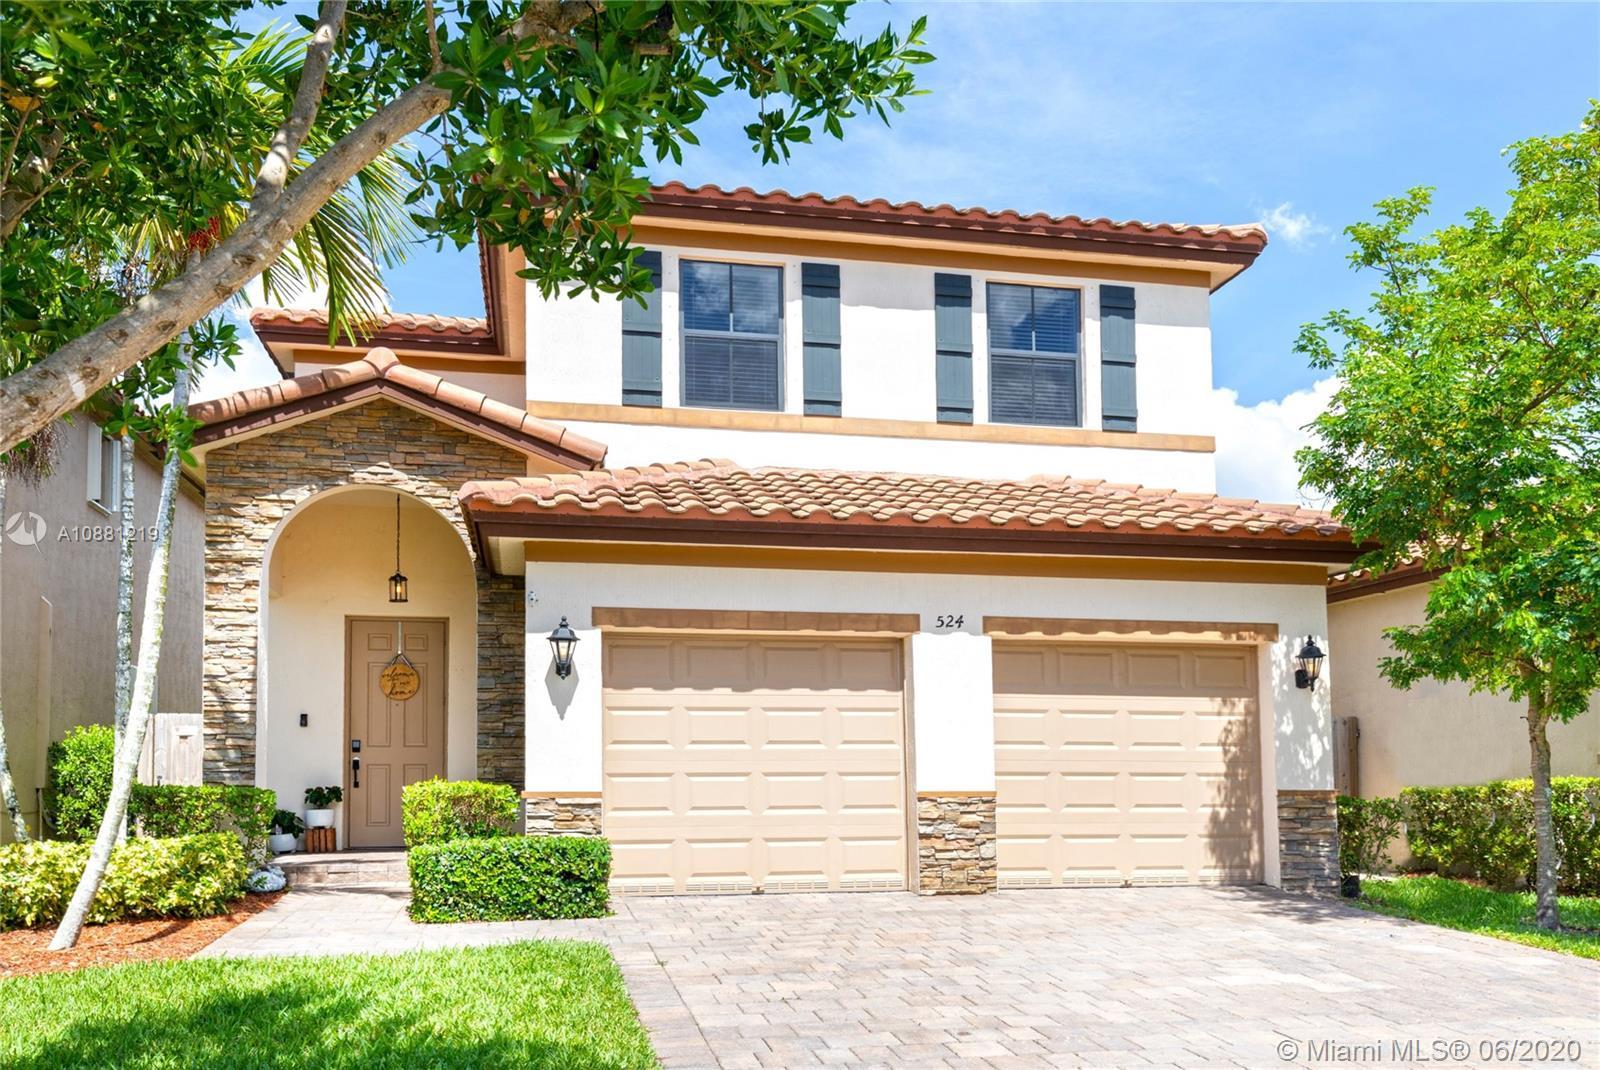 524 SE 34th Ter Property Photo - Homestead, FL real estate listing